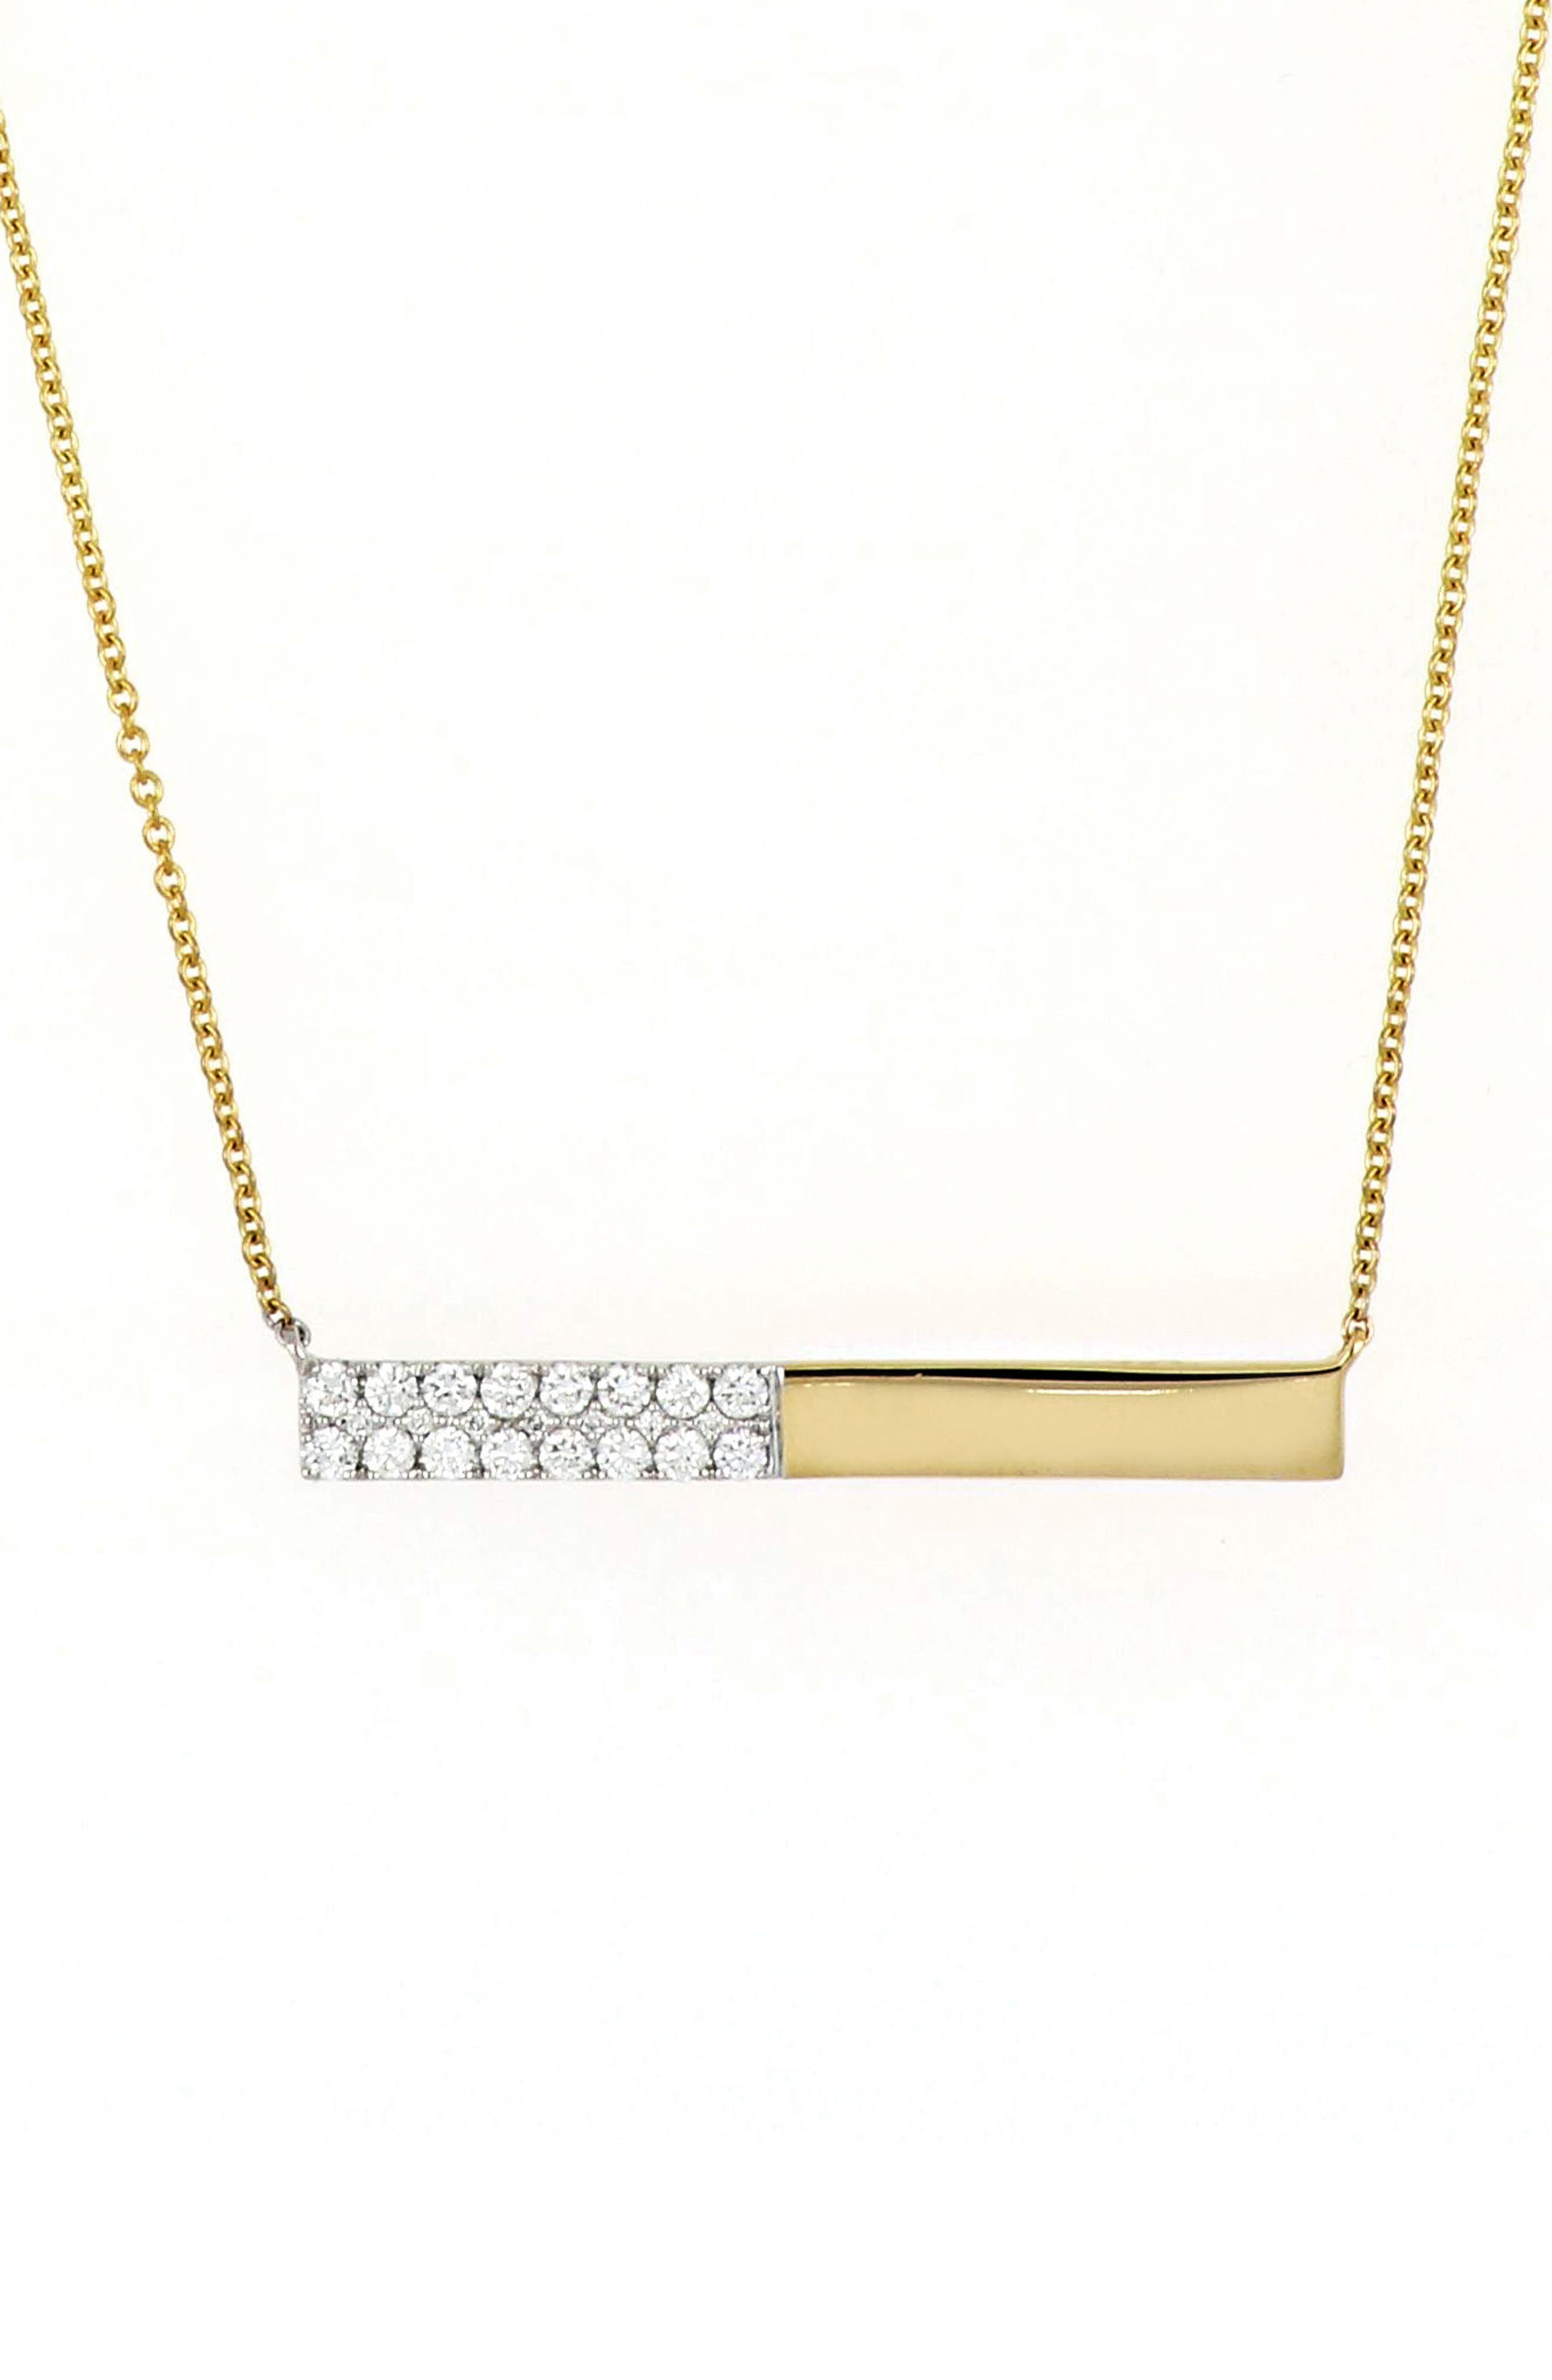 Kiera Diamond Bar Pendant Necklace,                             Main thumbnail 1, color,                             YELLOW GOLD/ WHITE GOLD